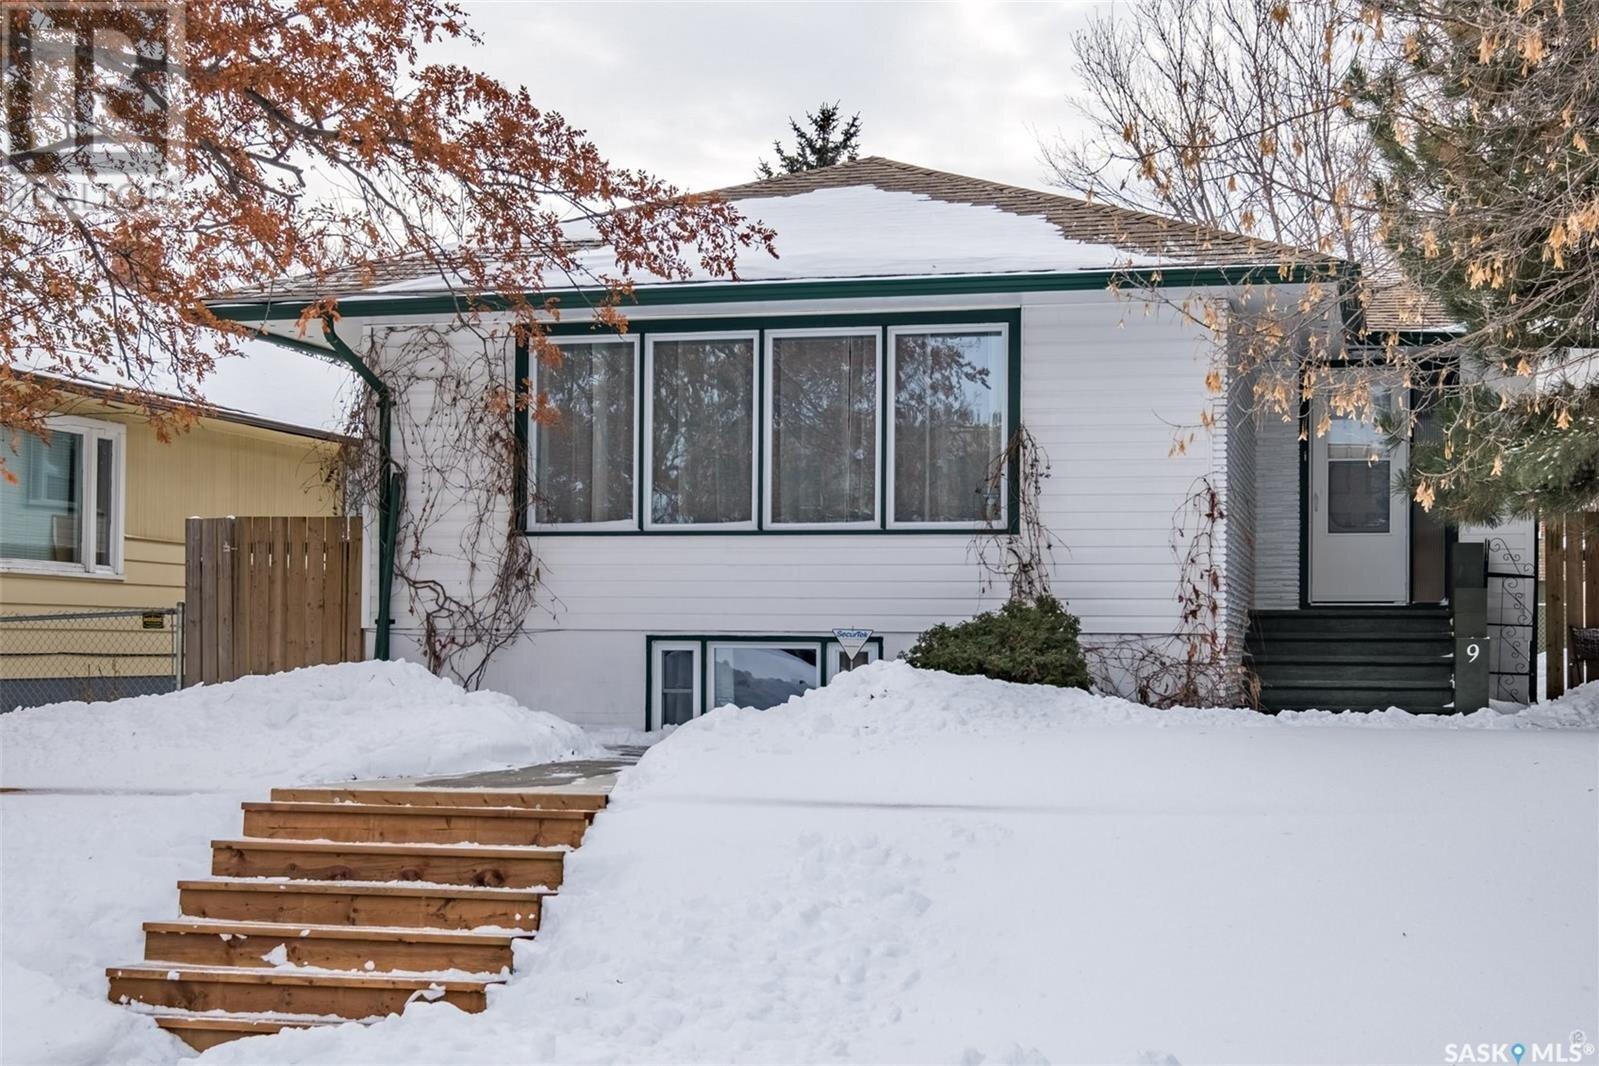 House for sale at 9 21st St E Prince Albert Saskatchewan - MLS: SK833366